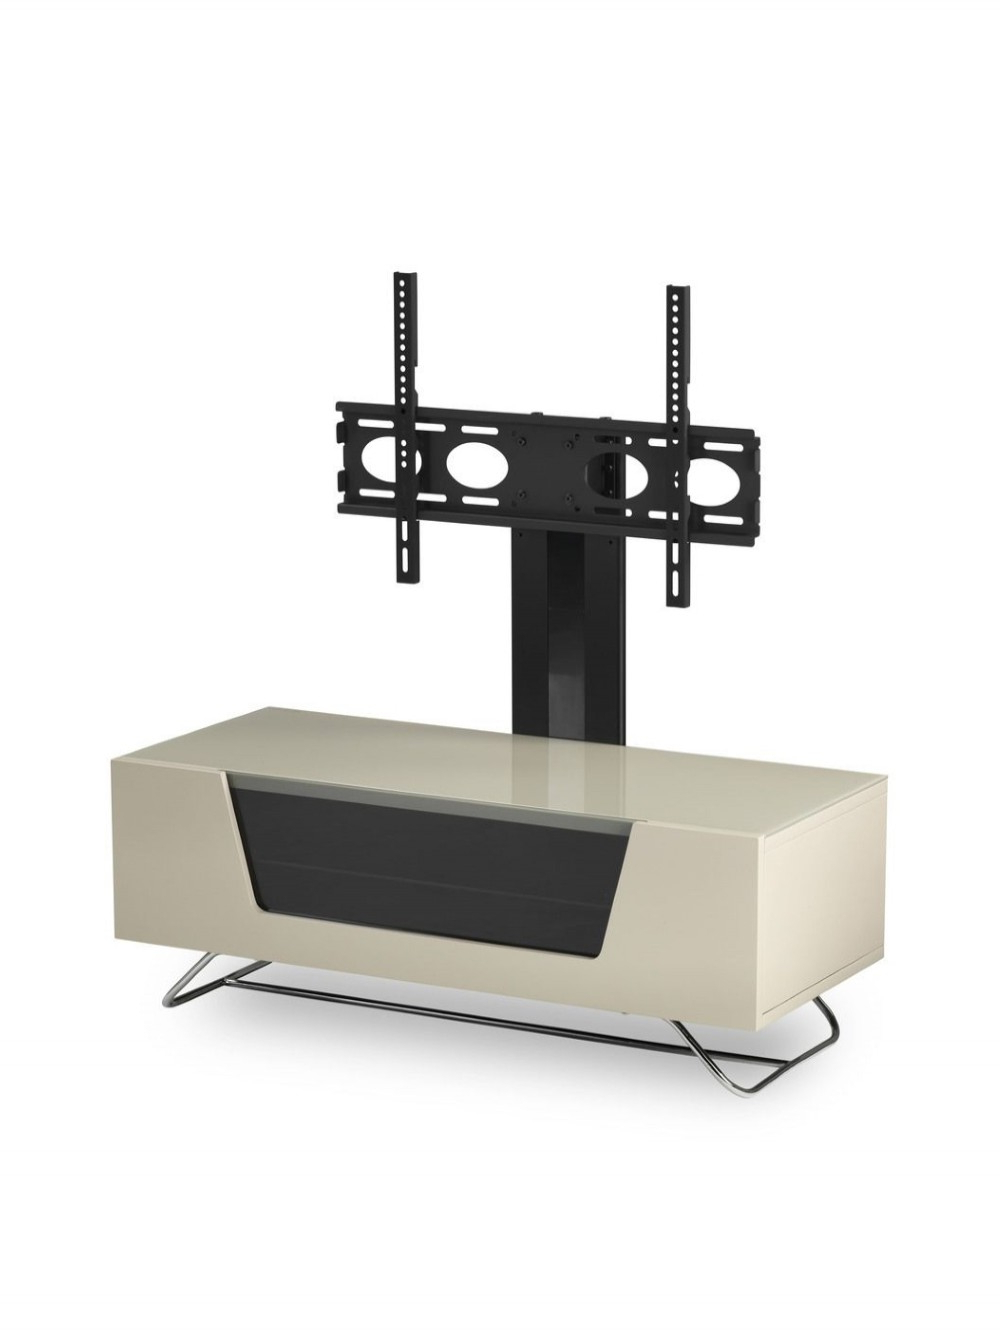 Alphason Chromium Cantilever Tv Stand Cro2 1200bkt Iv Inside Chromium Tv Stands (View 14 of 20)